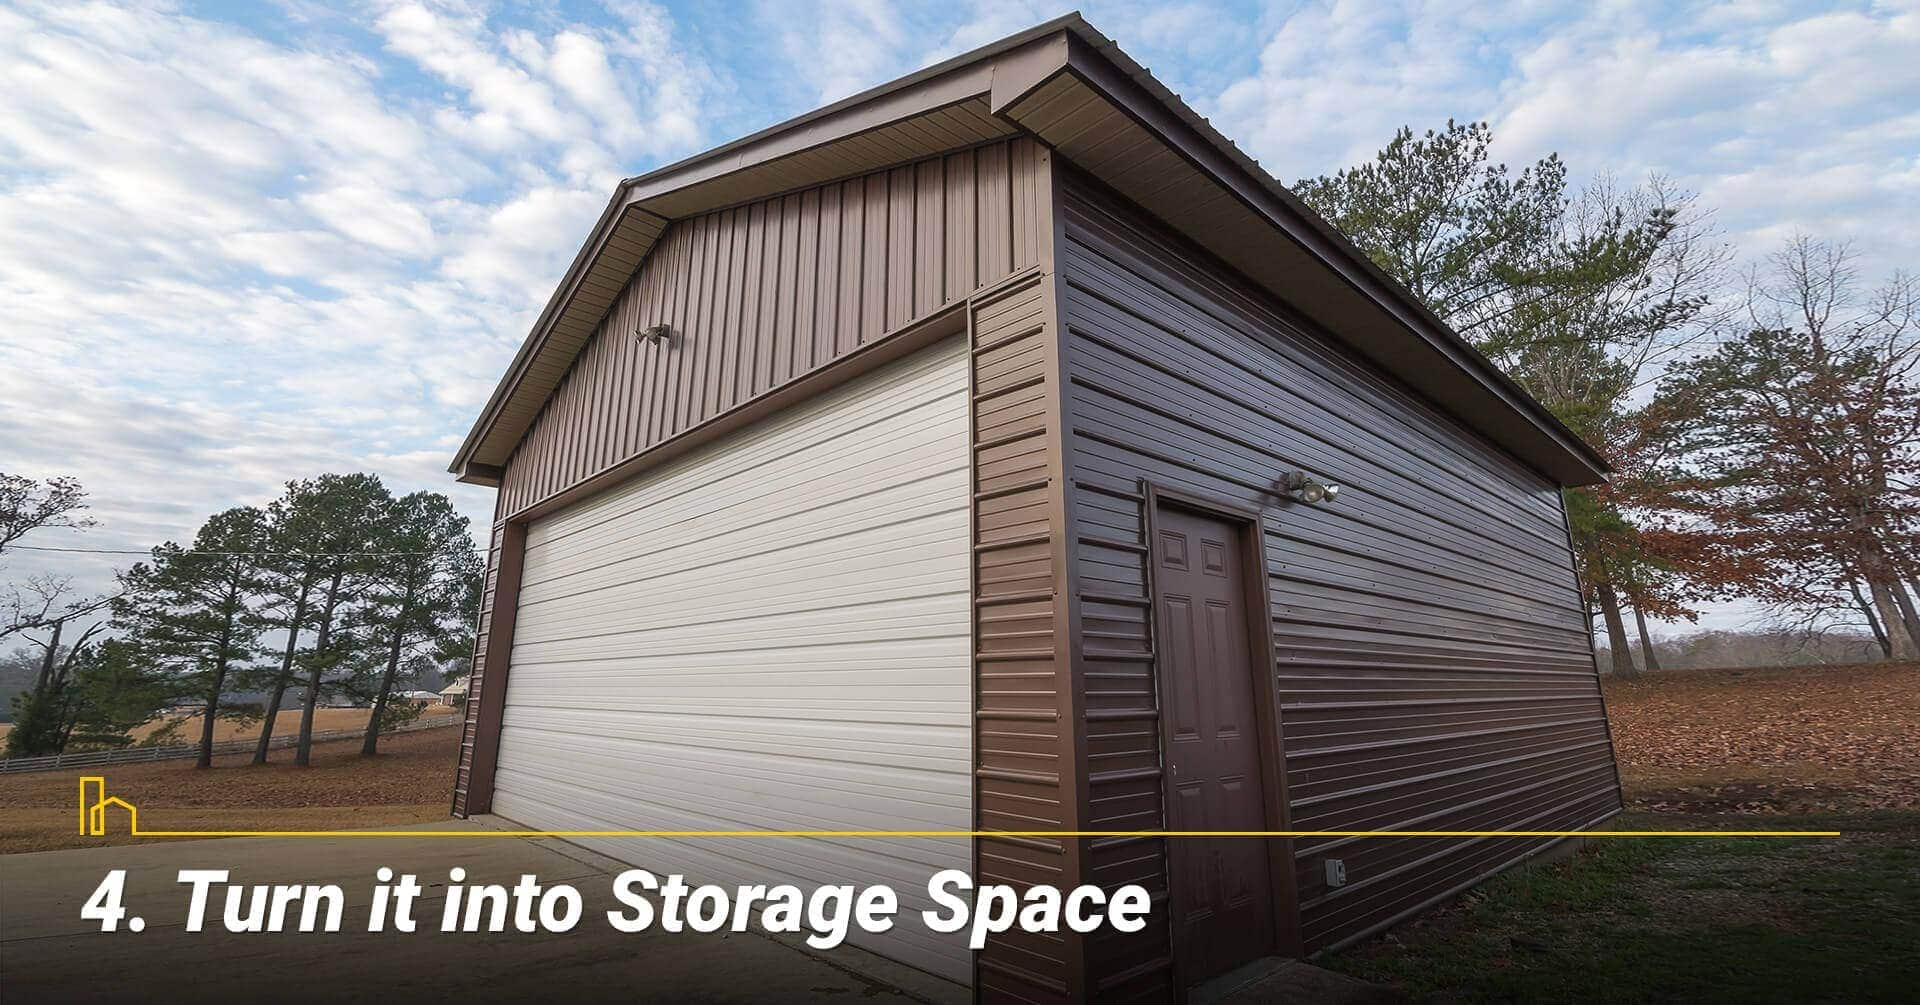 Turn it into Storage Space